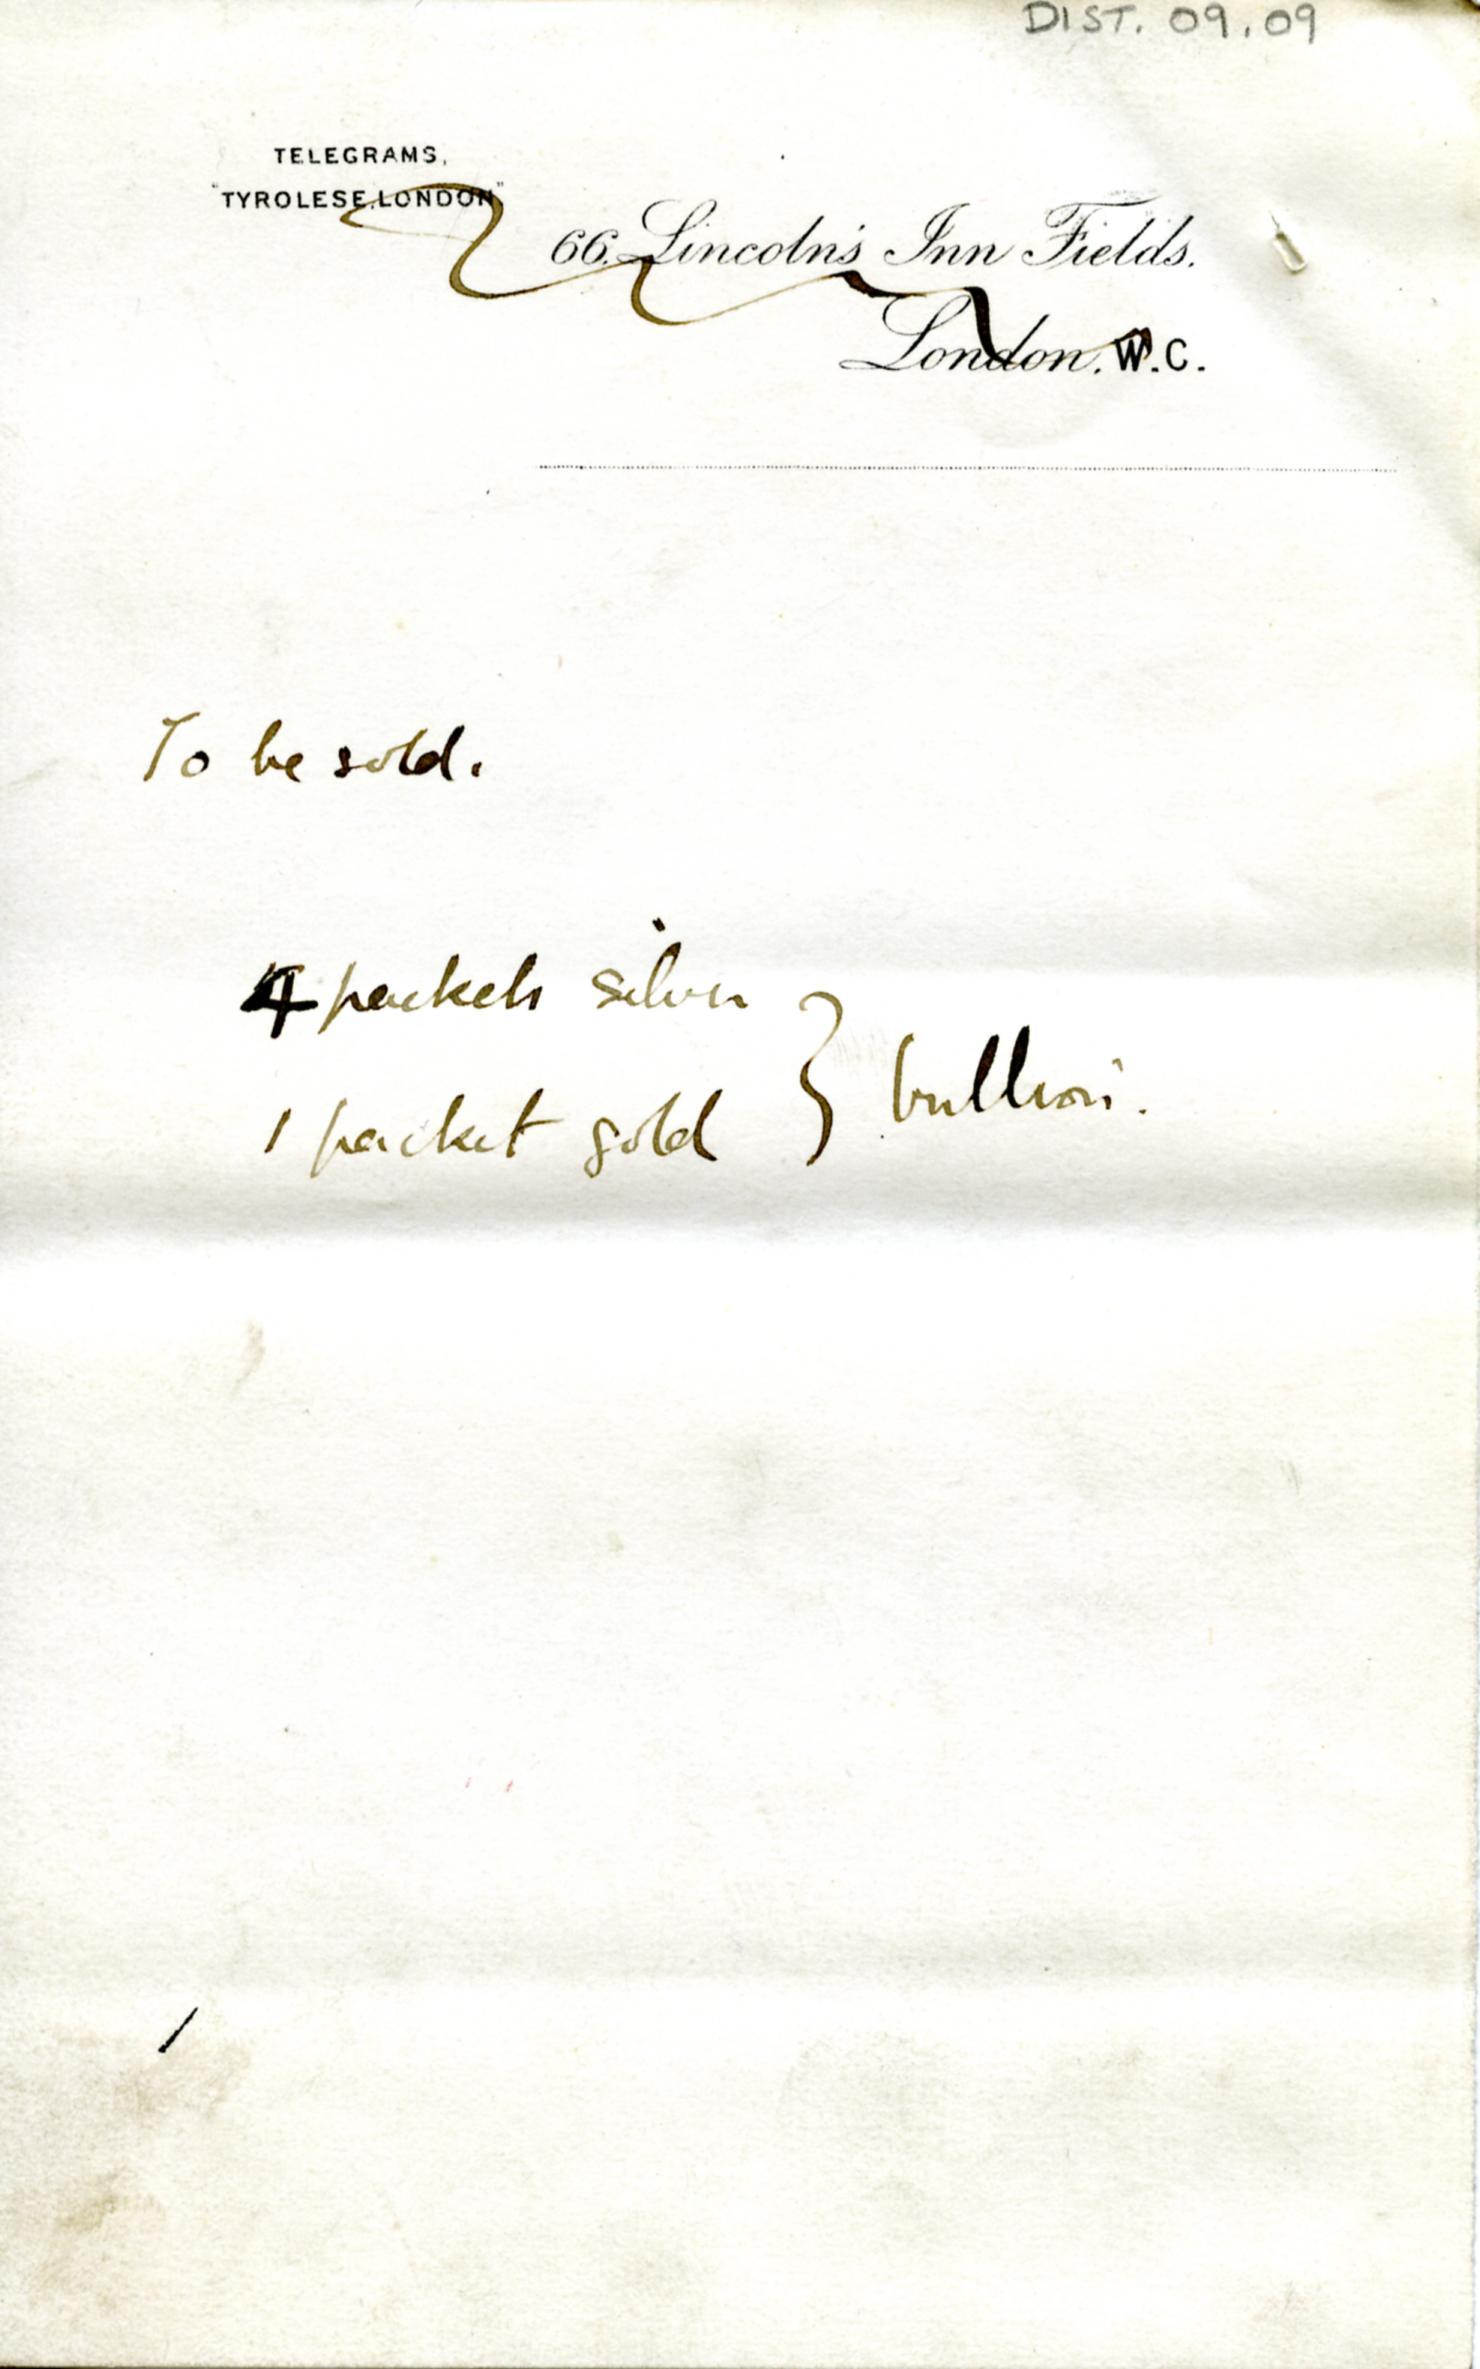 1886 Nebesheh Tell Dafana 1884 el-Qantara, Tell Gemayemi, Tell Sueilin DIST.09.09a